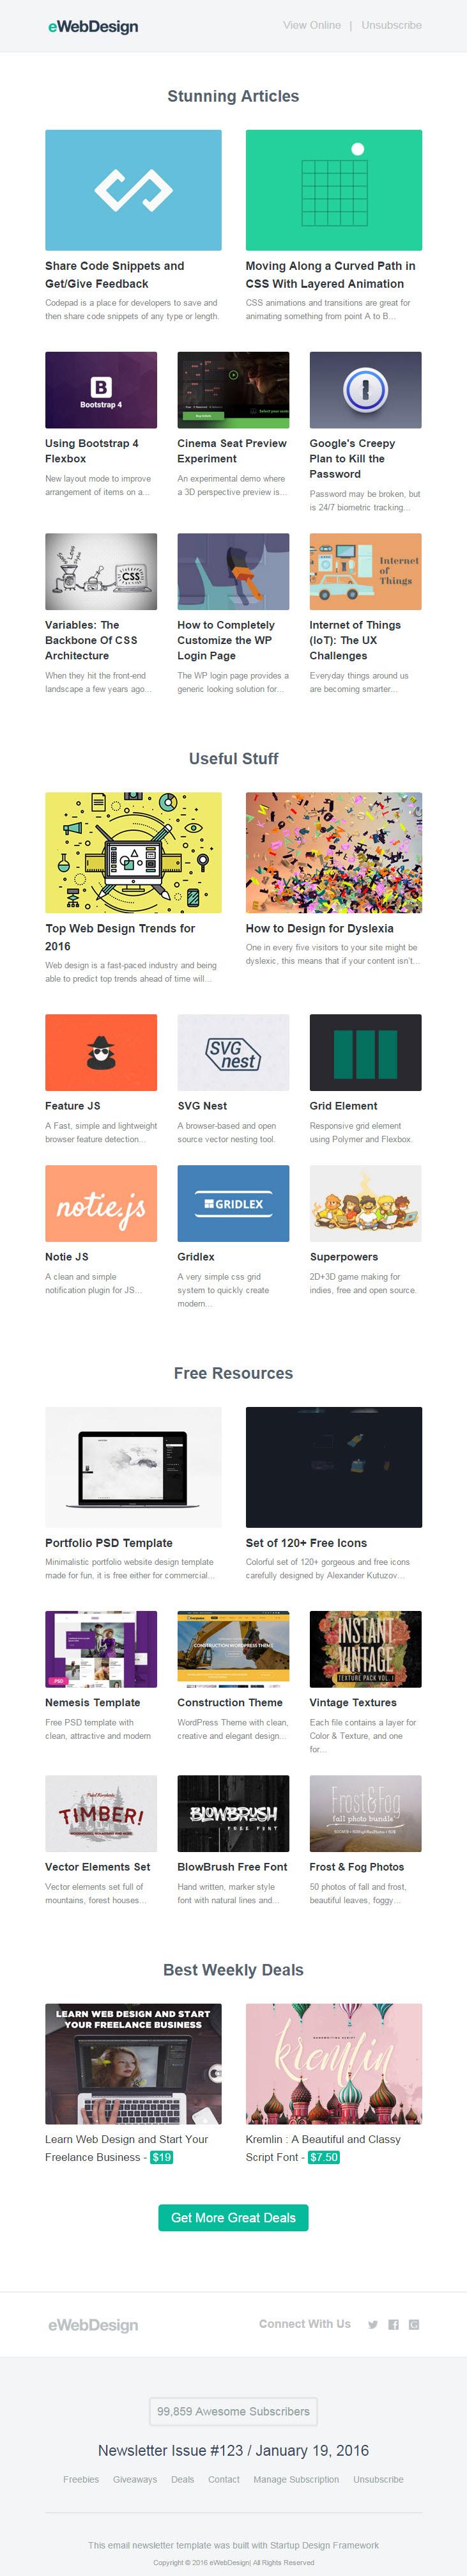 ewebdesign